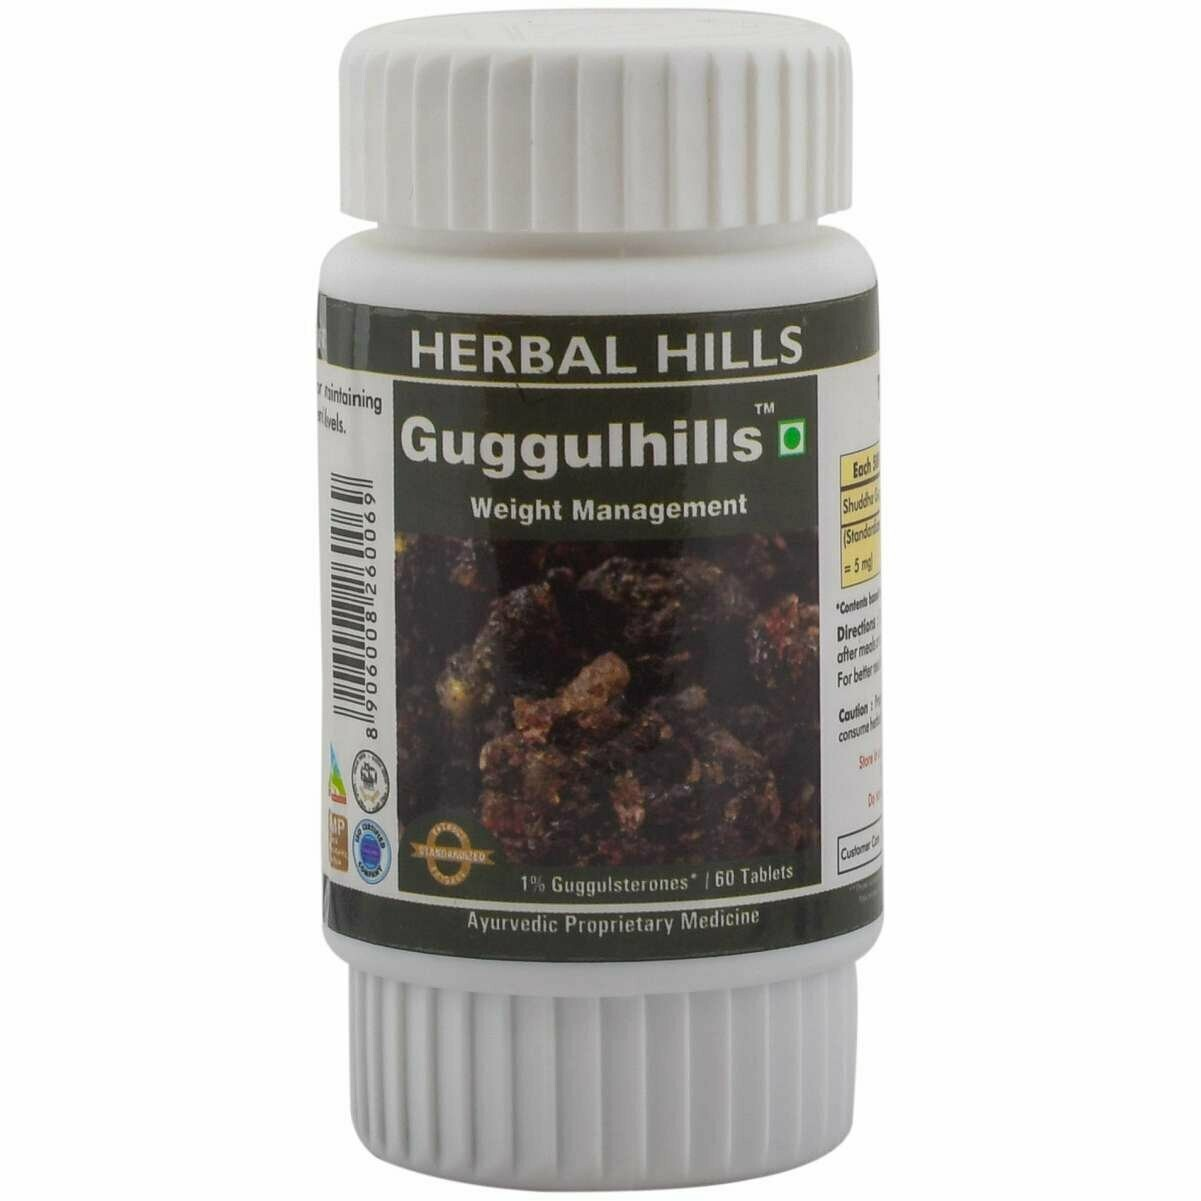 Herbal Hills Guggulhills 60Tablets